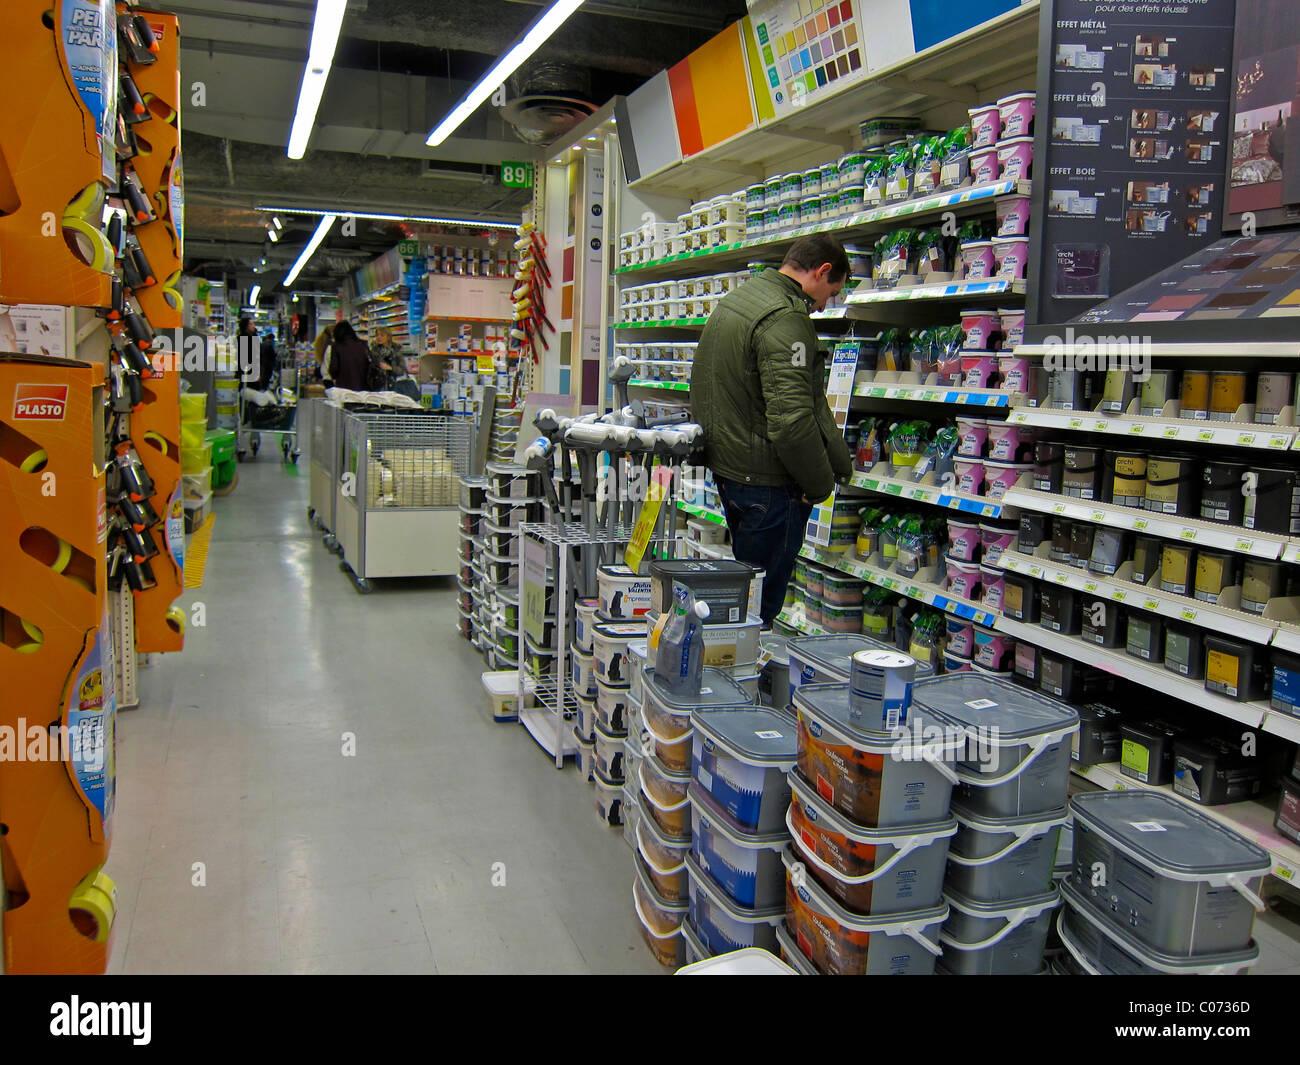 Leroy Merlin Photos Leroy Merlin Images Alamy